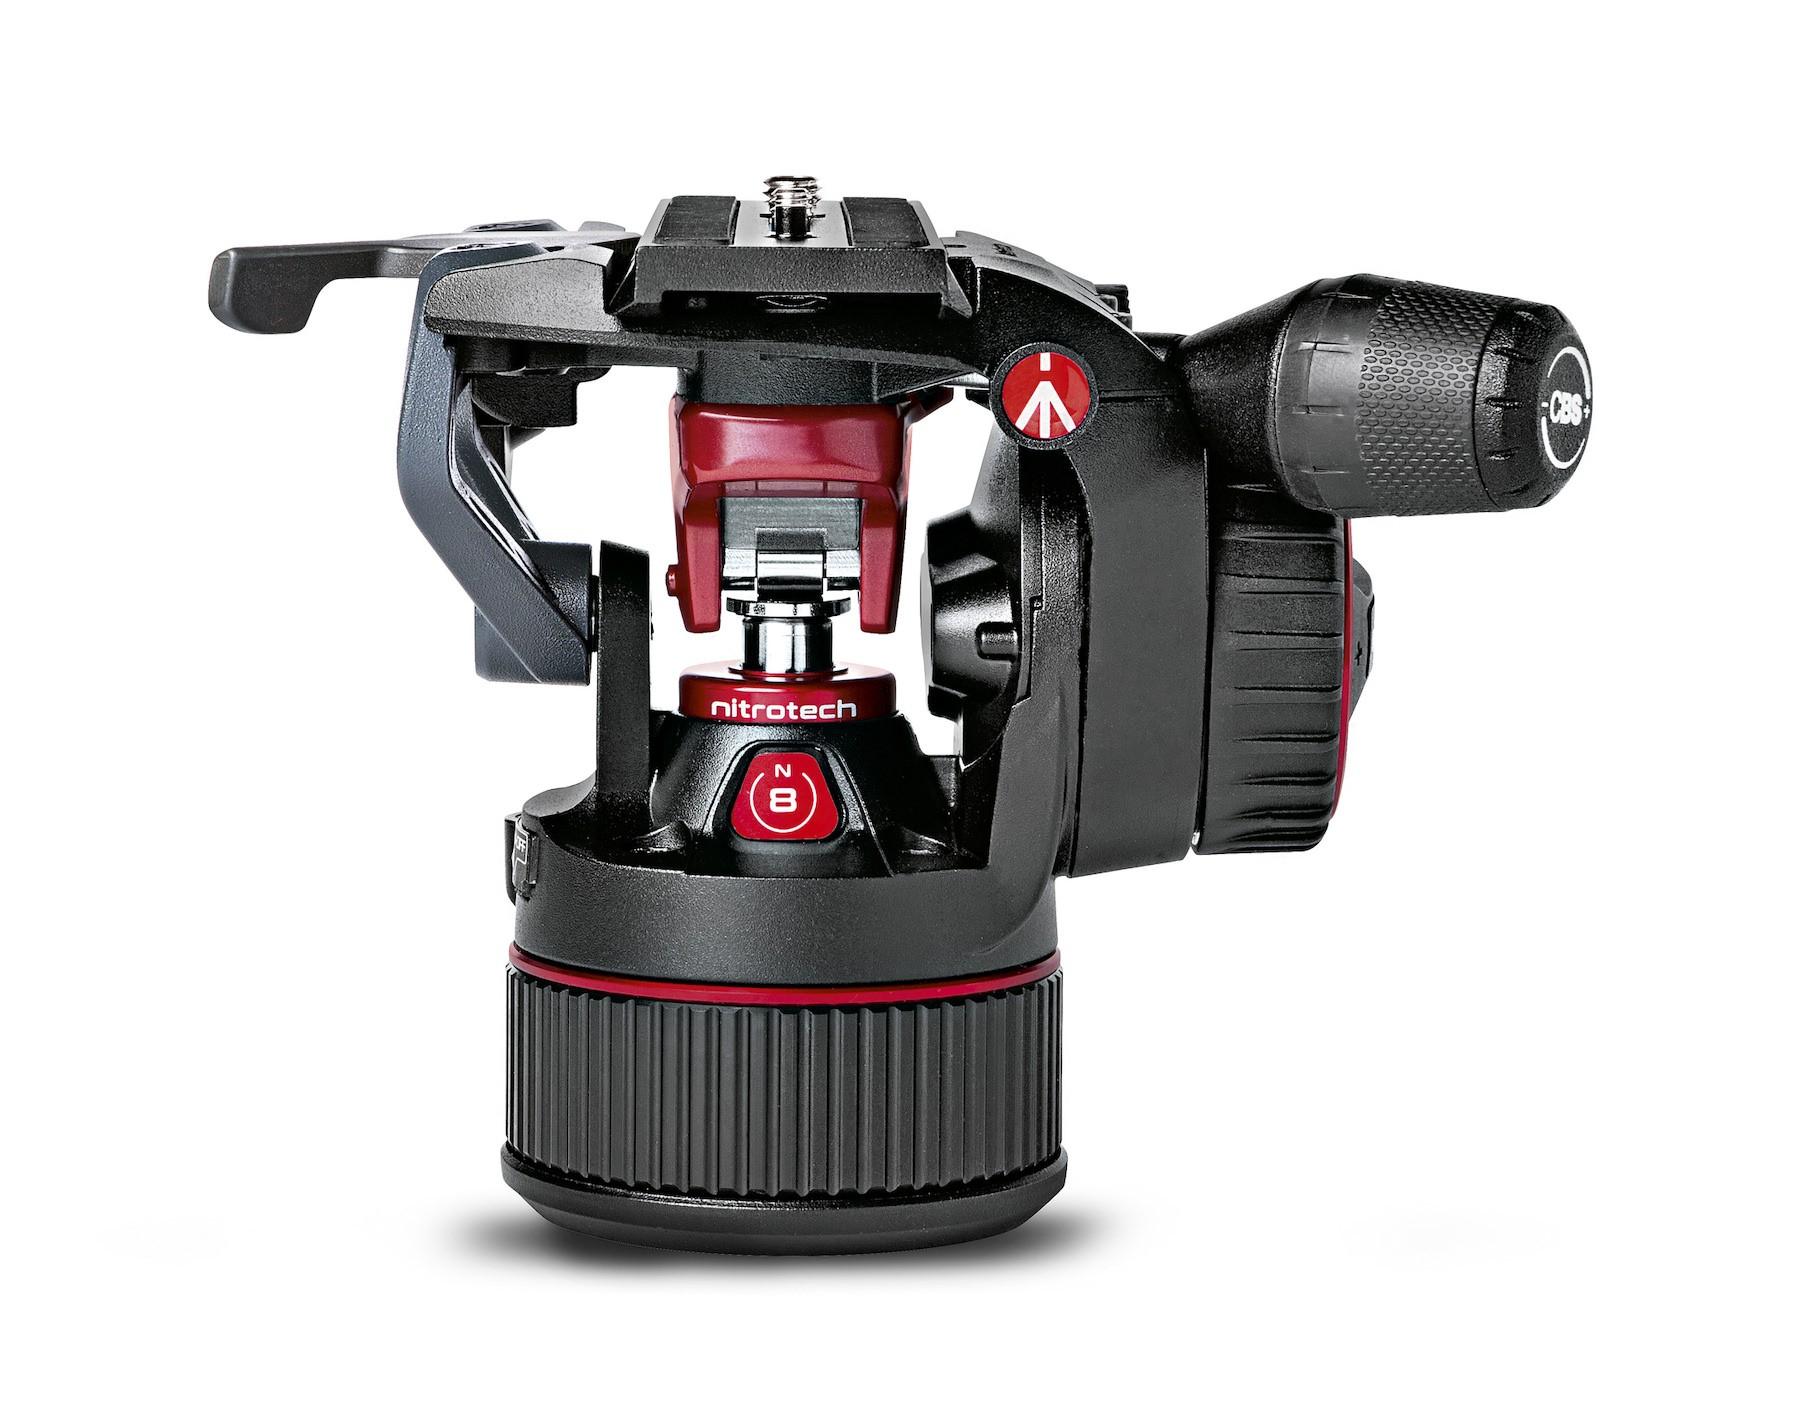 Manfrotto 509HD Pro Video Head 100. Штативные головки Manfrotto | Cтудийное оборудование и фототехника